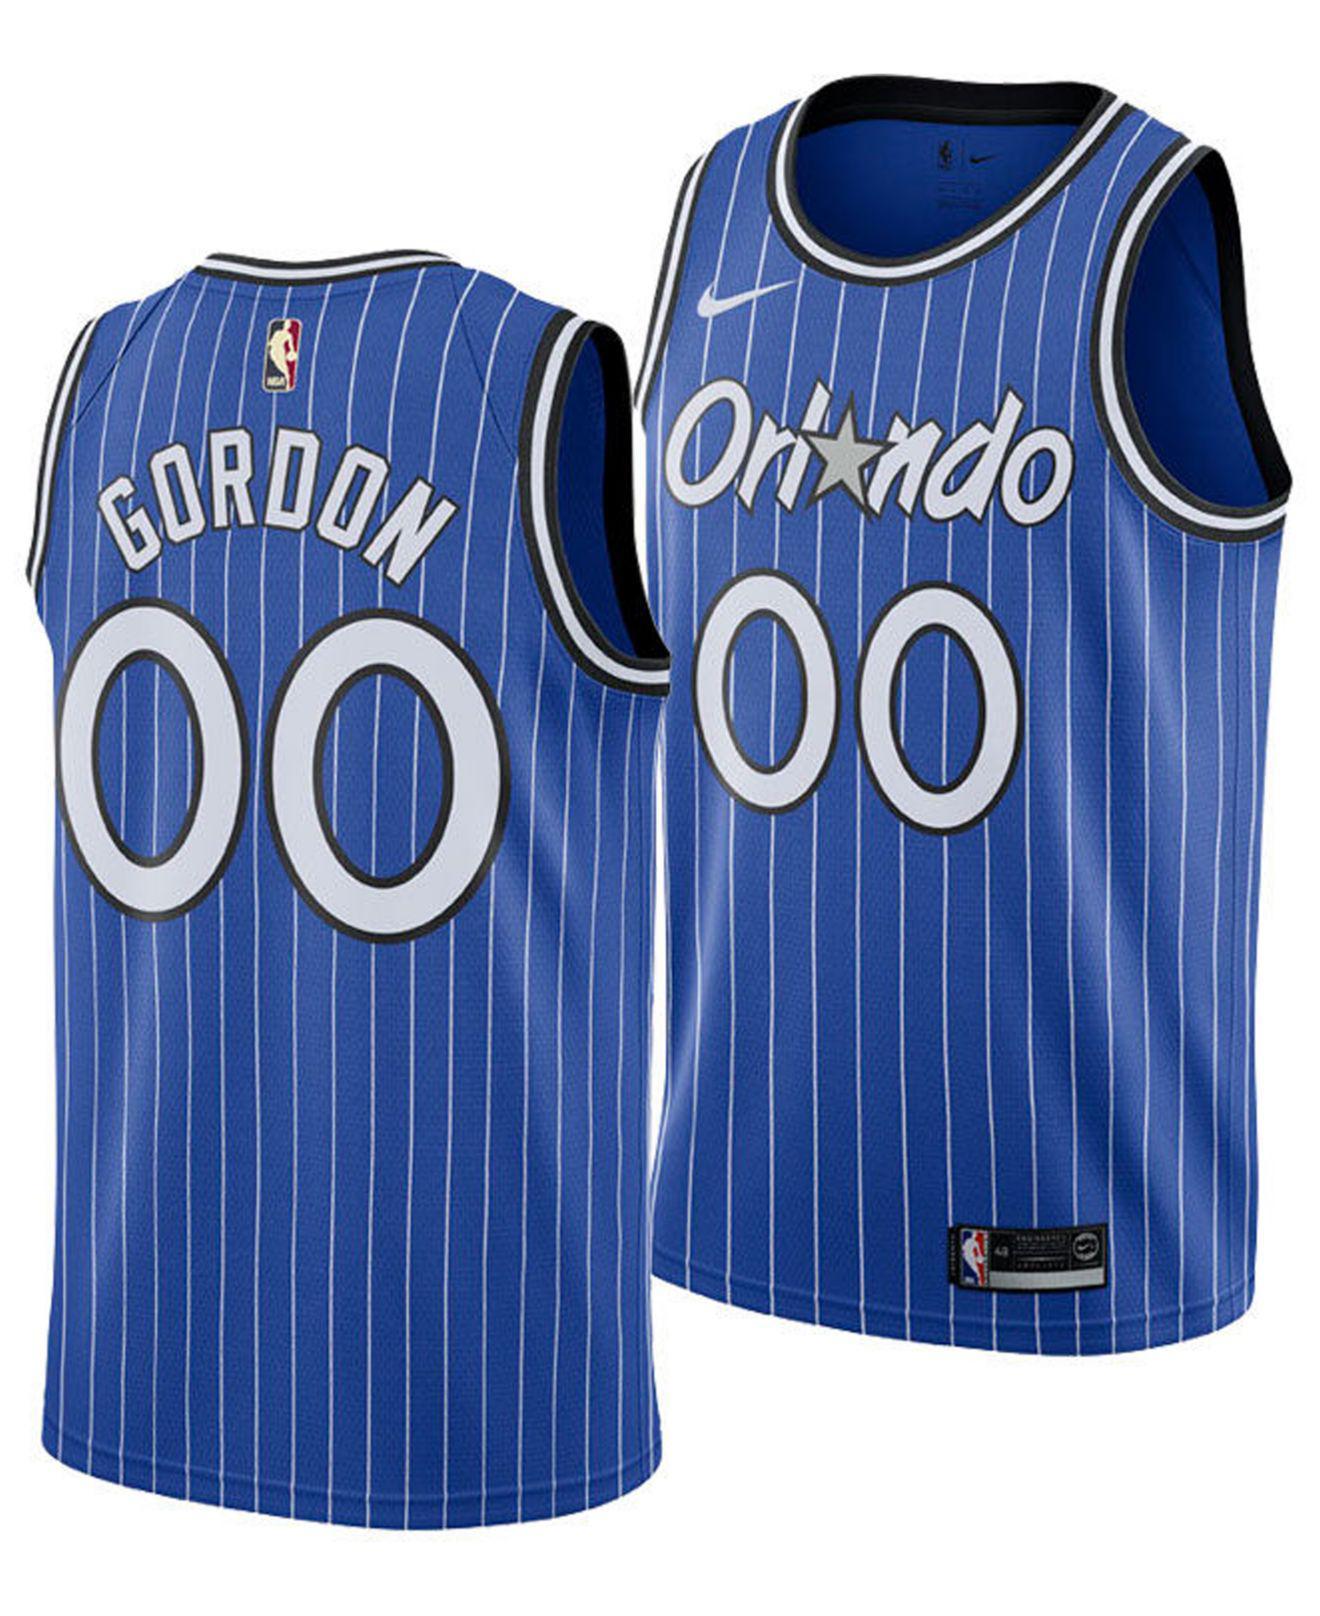 4882ac0c41a Nike - Blue Aaron Gordon Orlando Magic Hardwood Classic Swingman Jersey for  Men - Lyst. View fullscreen